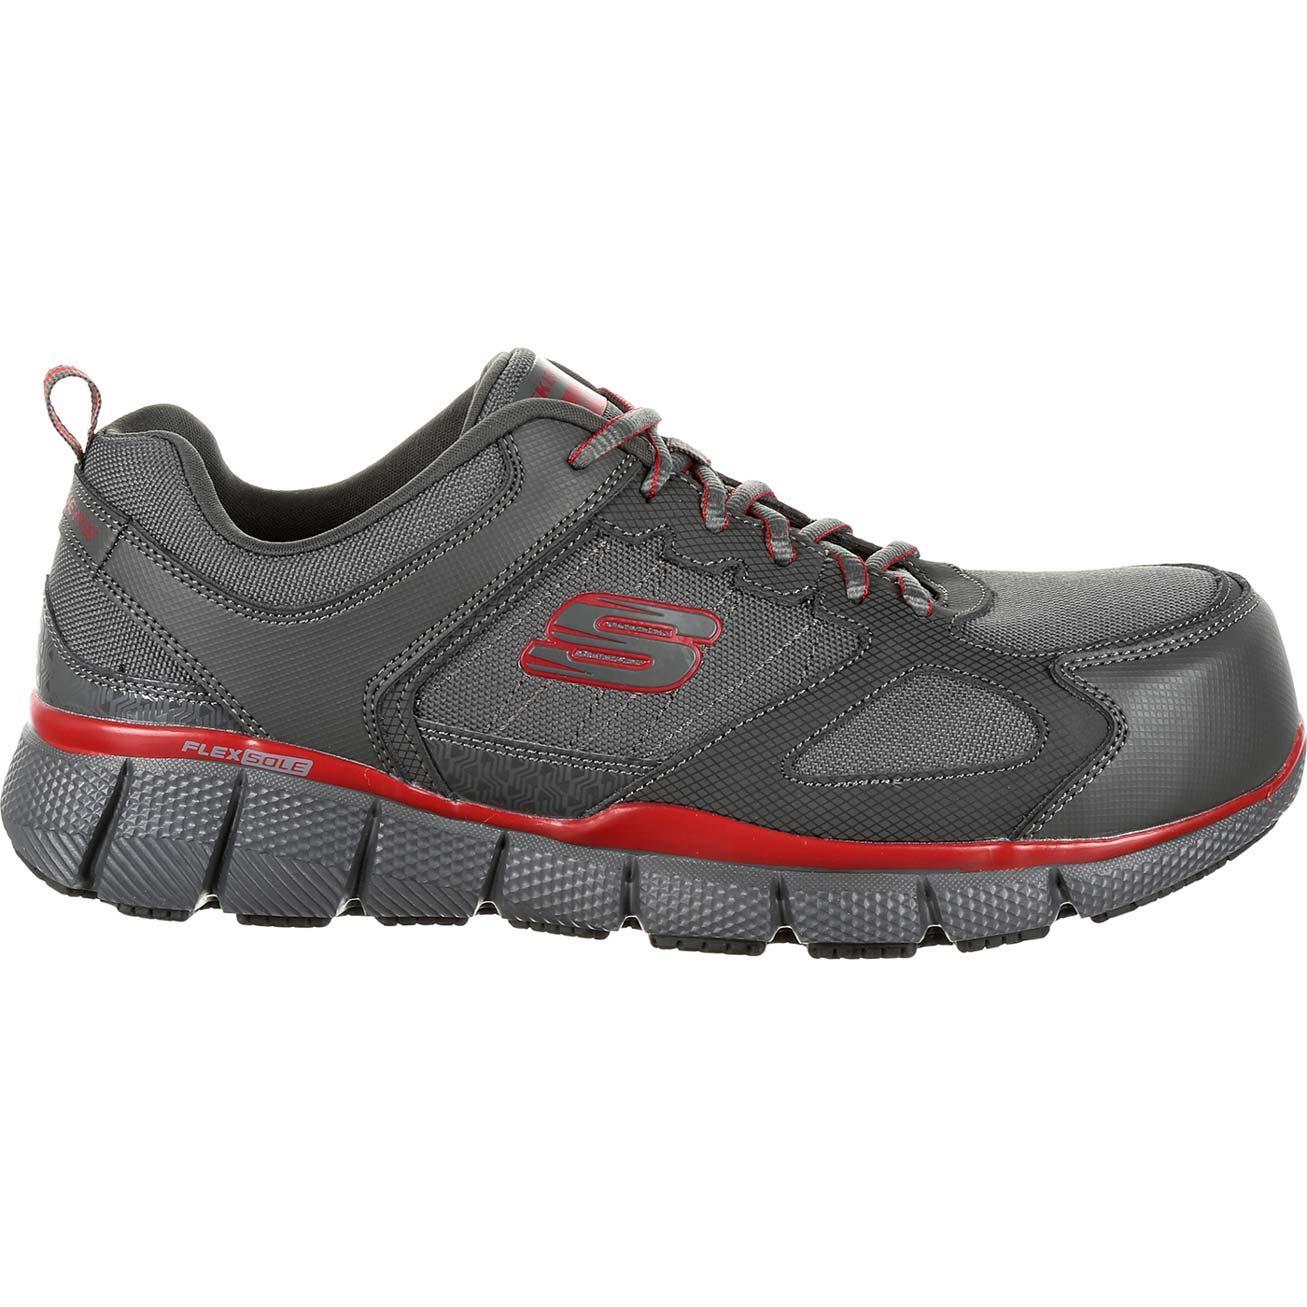 616c0ac5e509 Loading zoom. SKECHERS Telfin Composite Toe Puncture-Resistant  Slip-Resistant ...